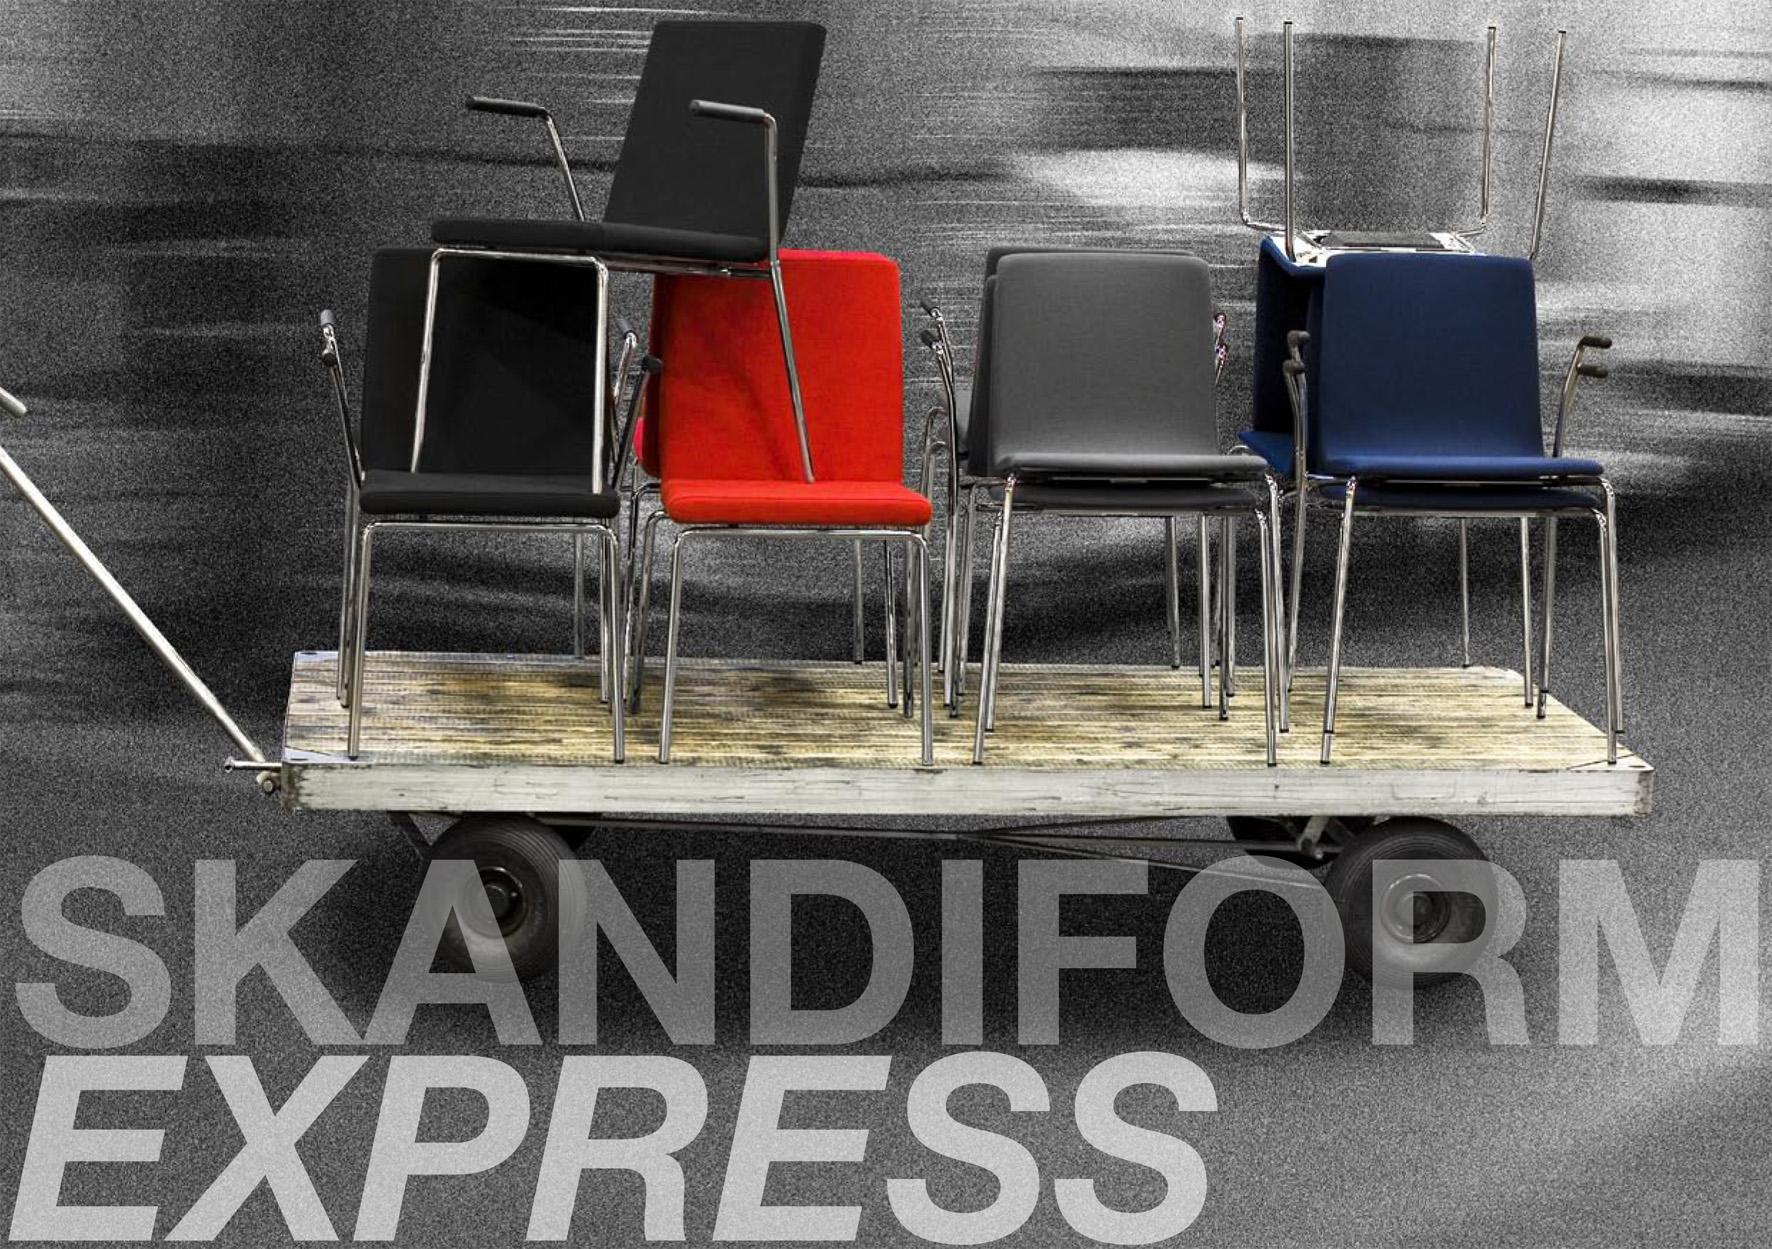 skandiform_express_postcard.jpg